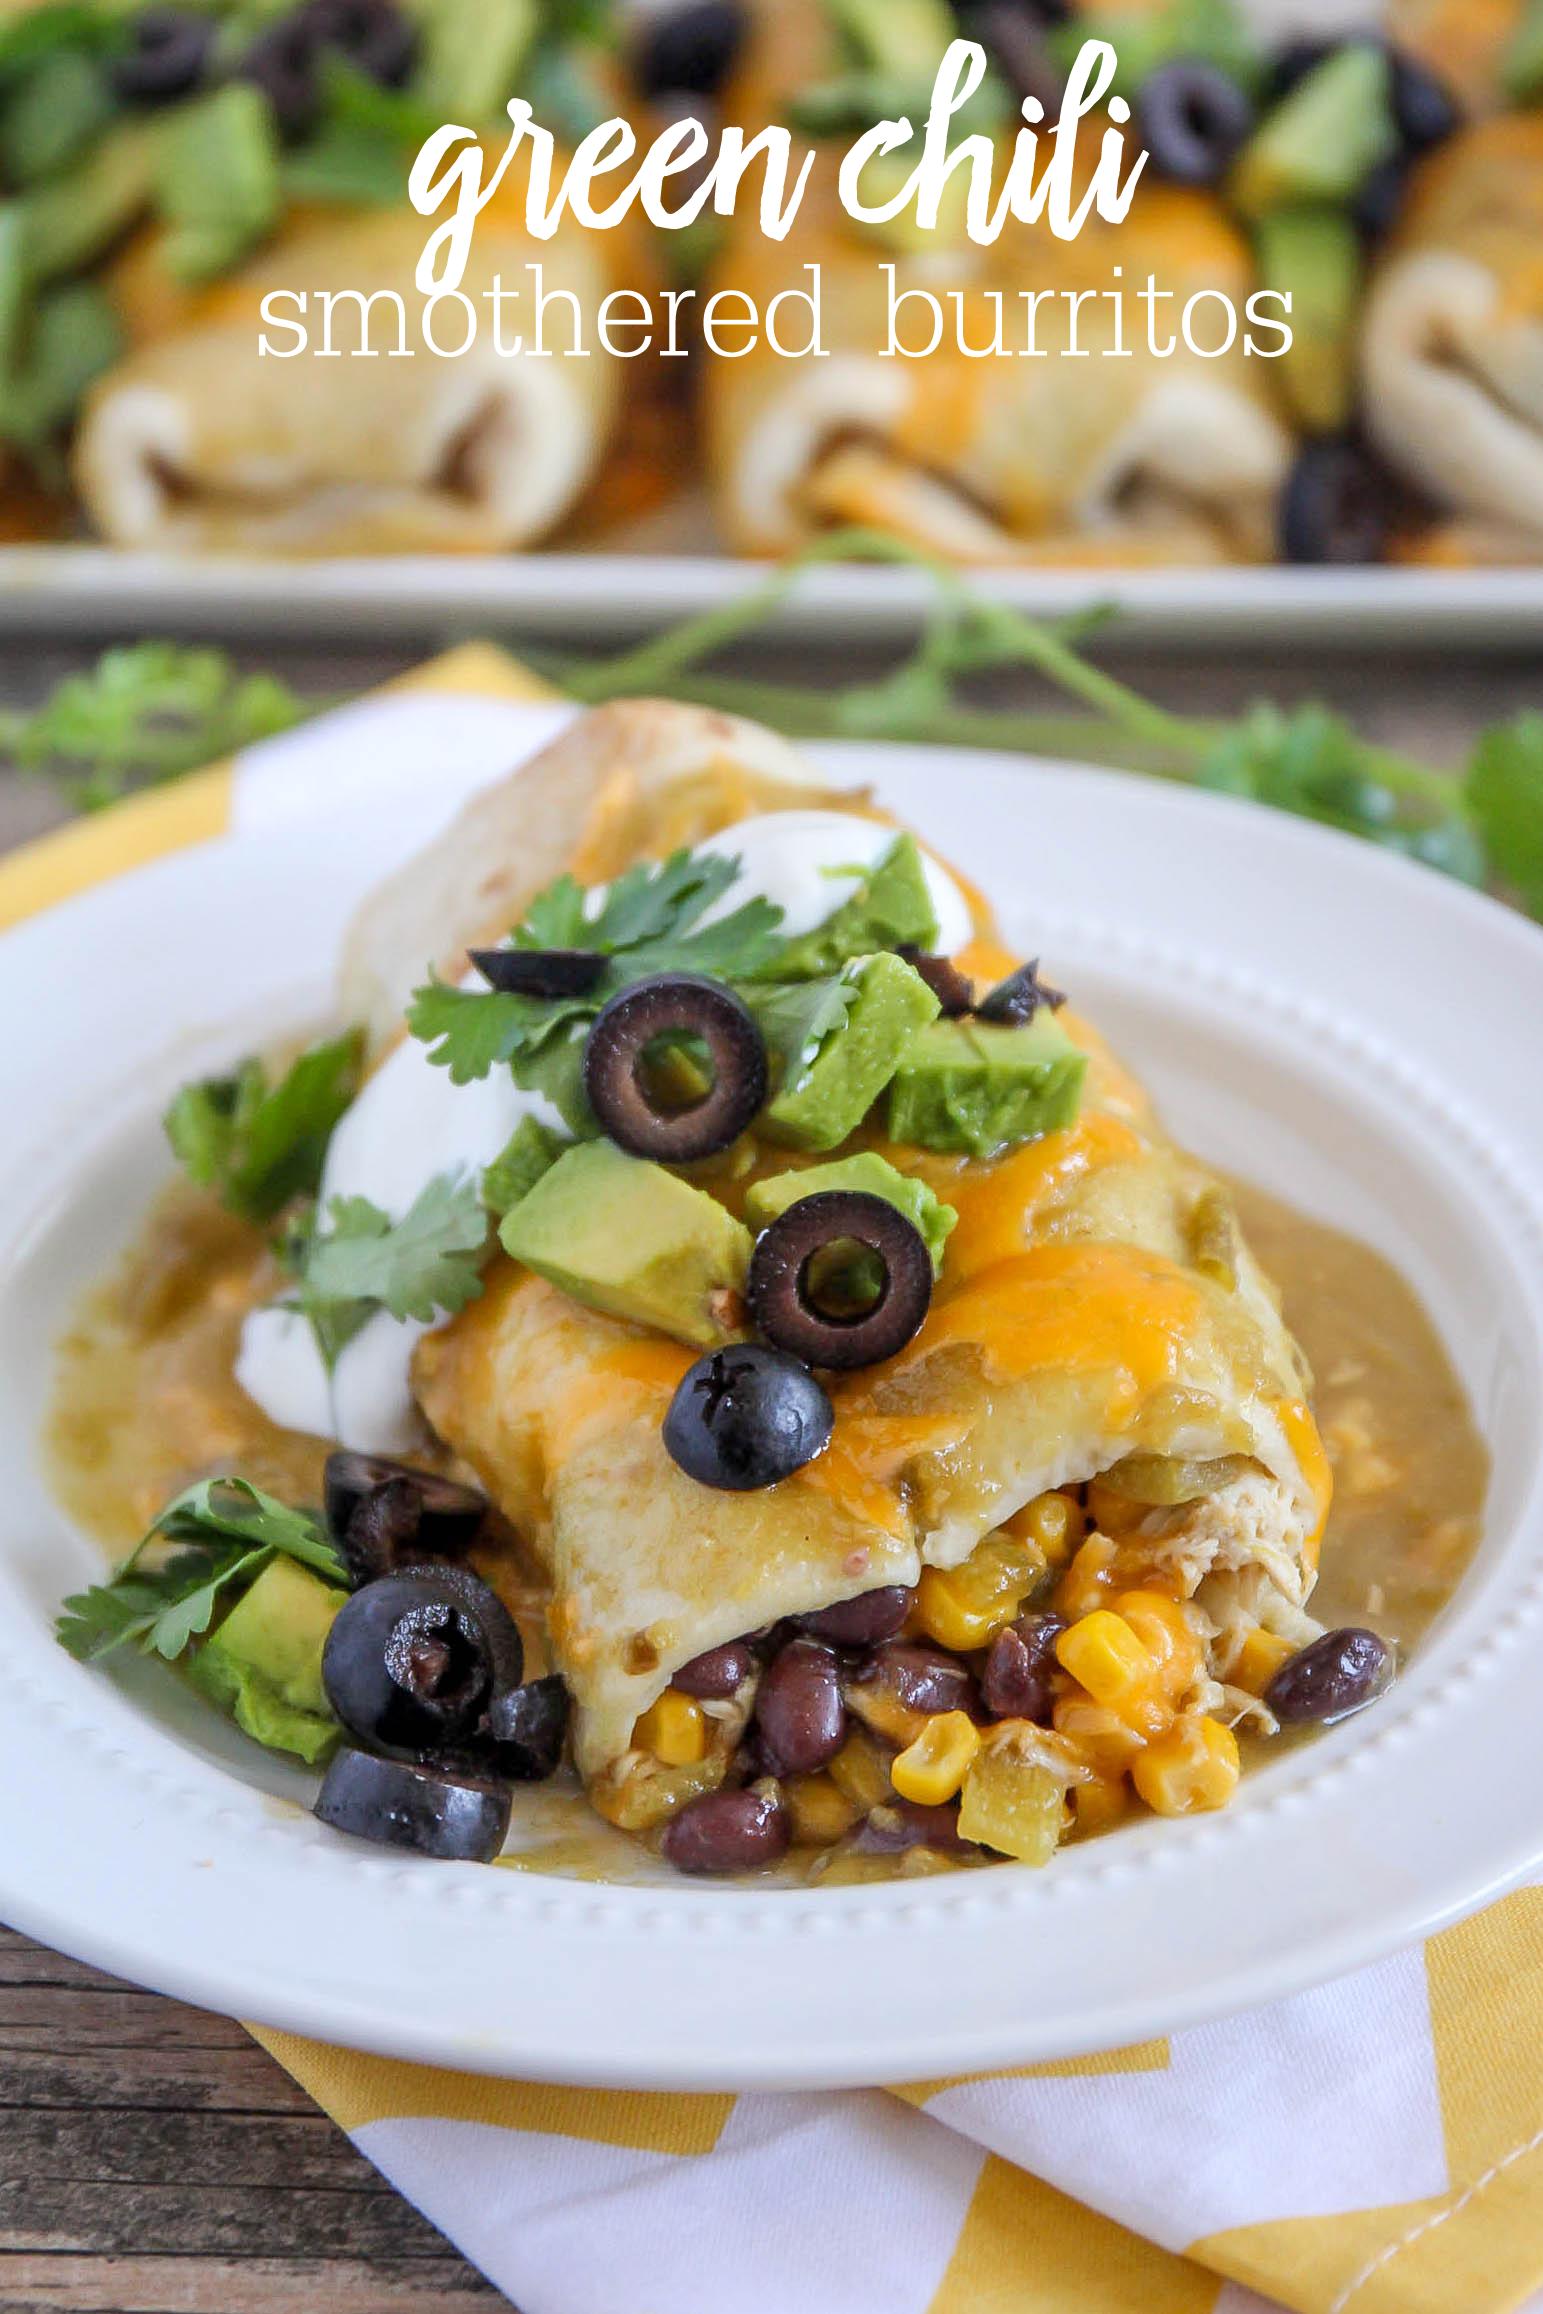 green-chili-smothered-burritos-1